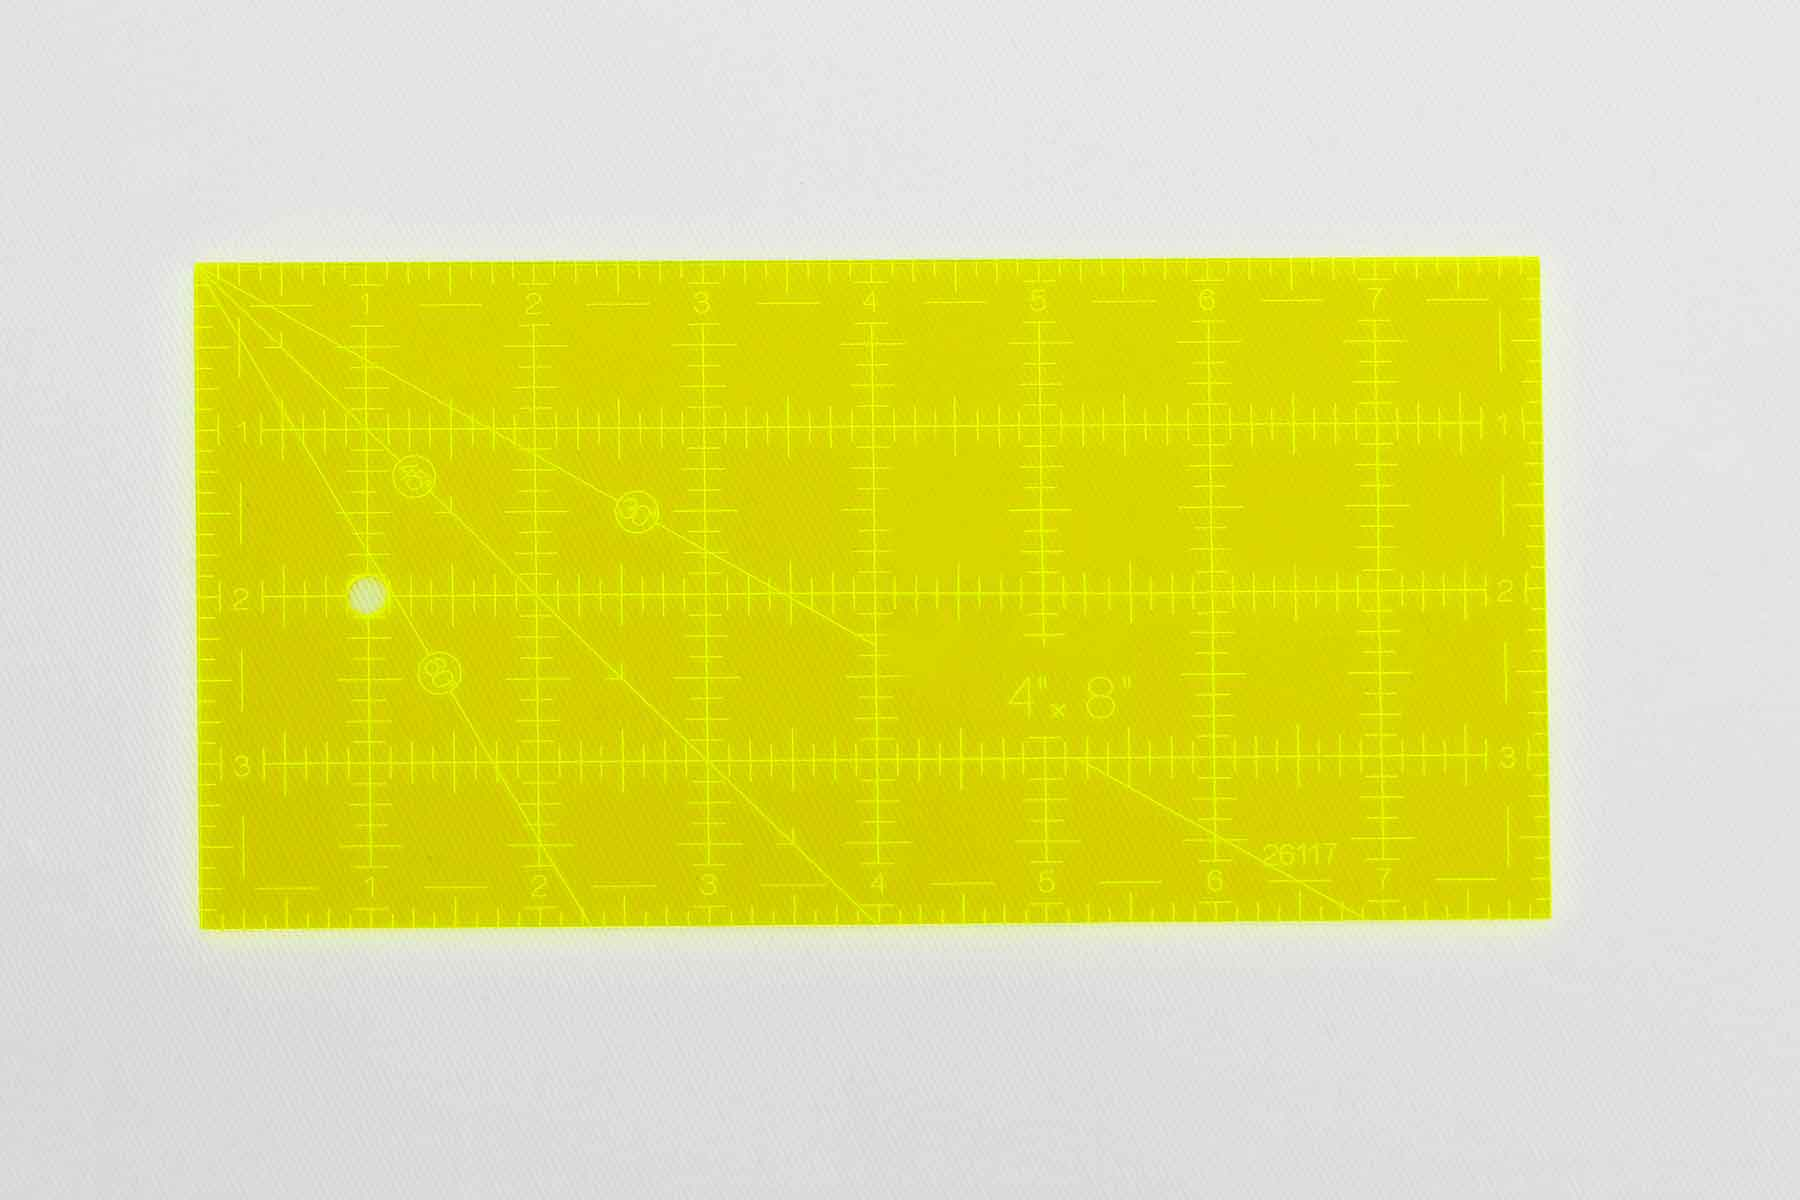 Régua Retangular 4 x 8 polegadas